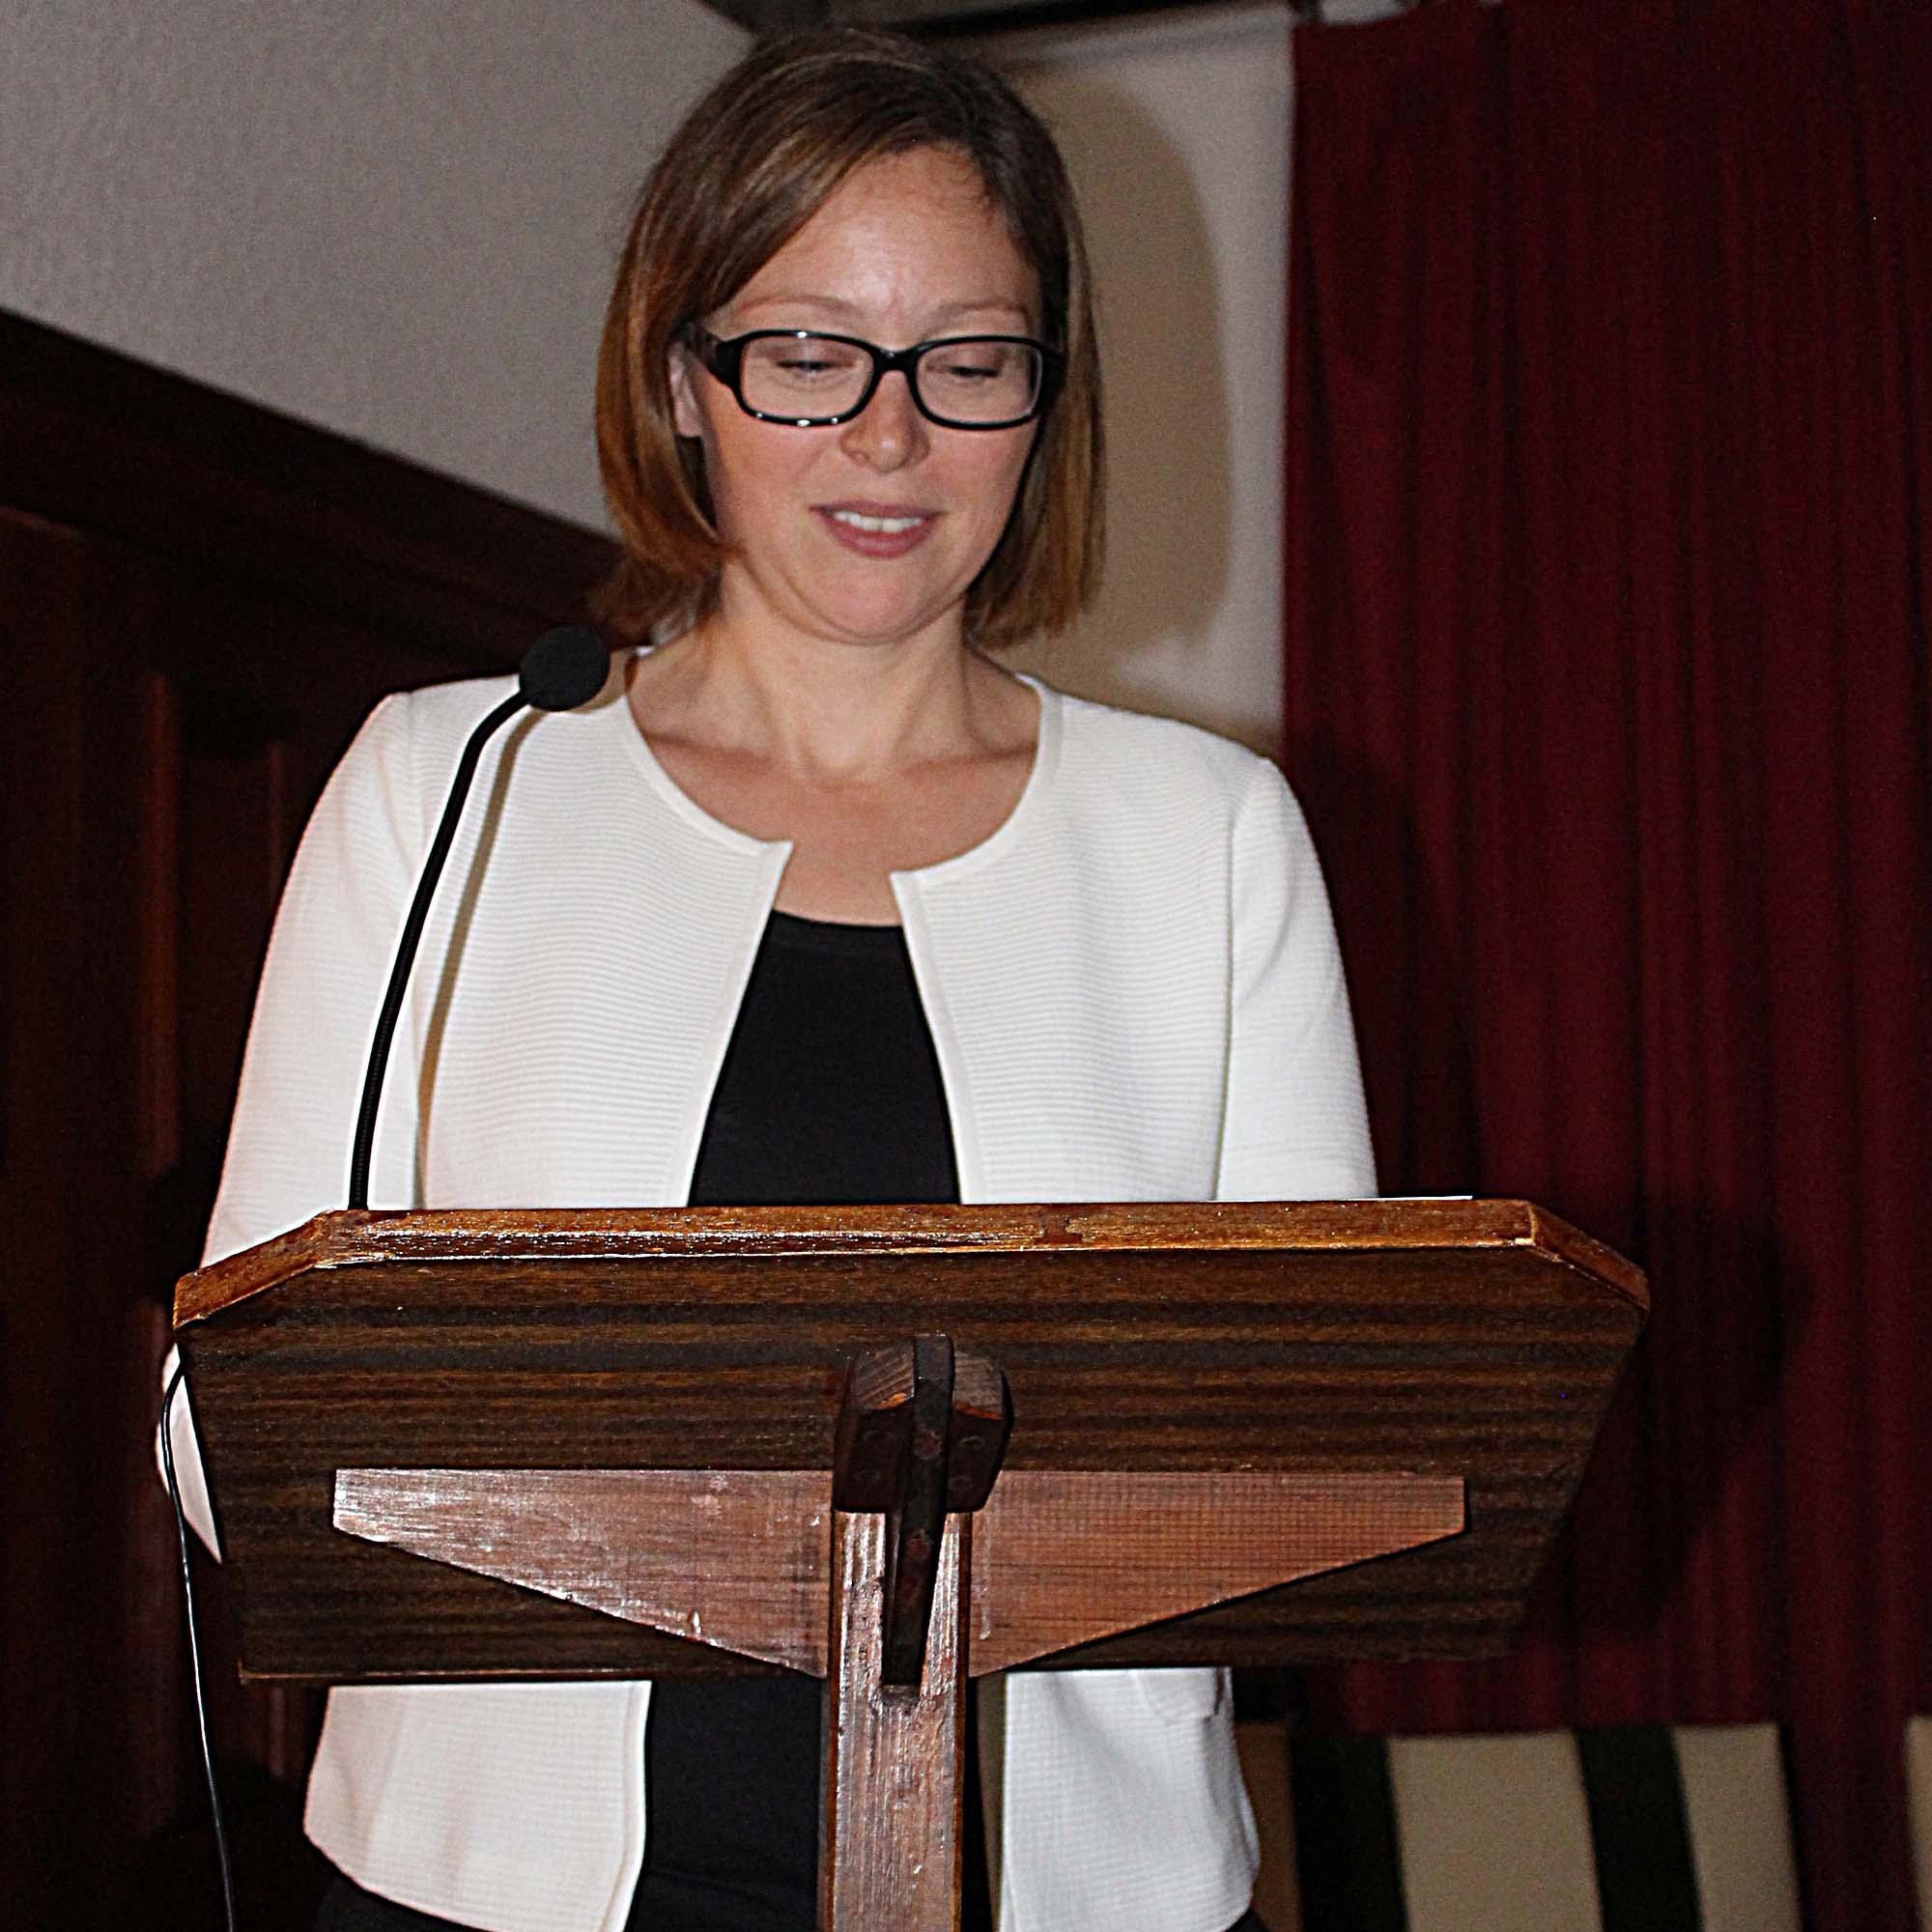 Sara Munsterhjelm